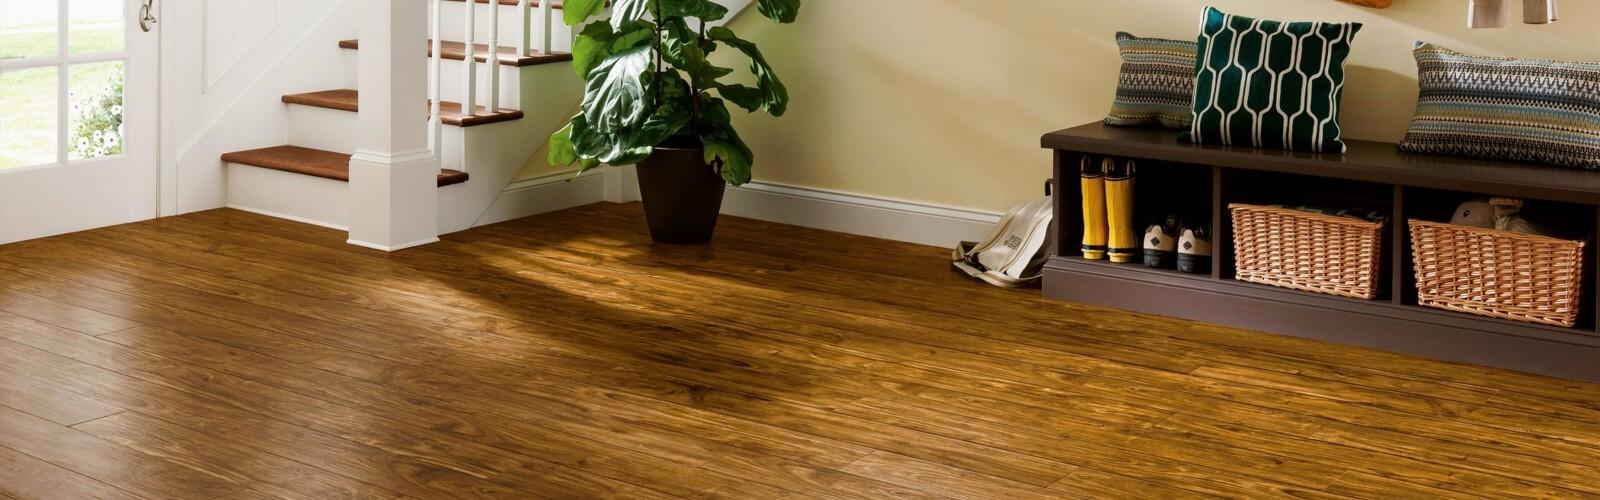 Luxury vinyl flooring   Haley's Flooring & Interiors